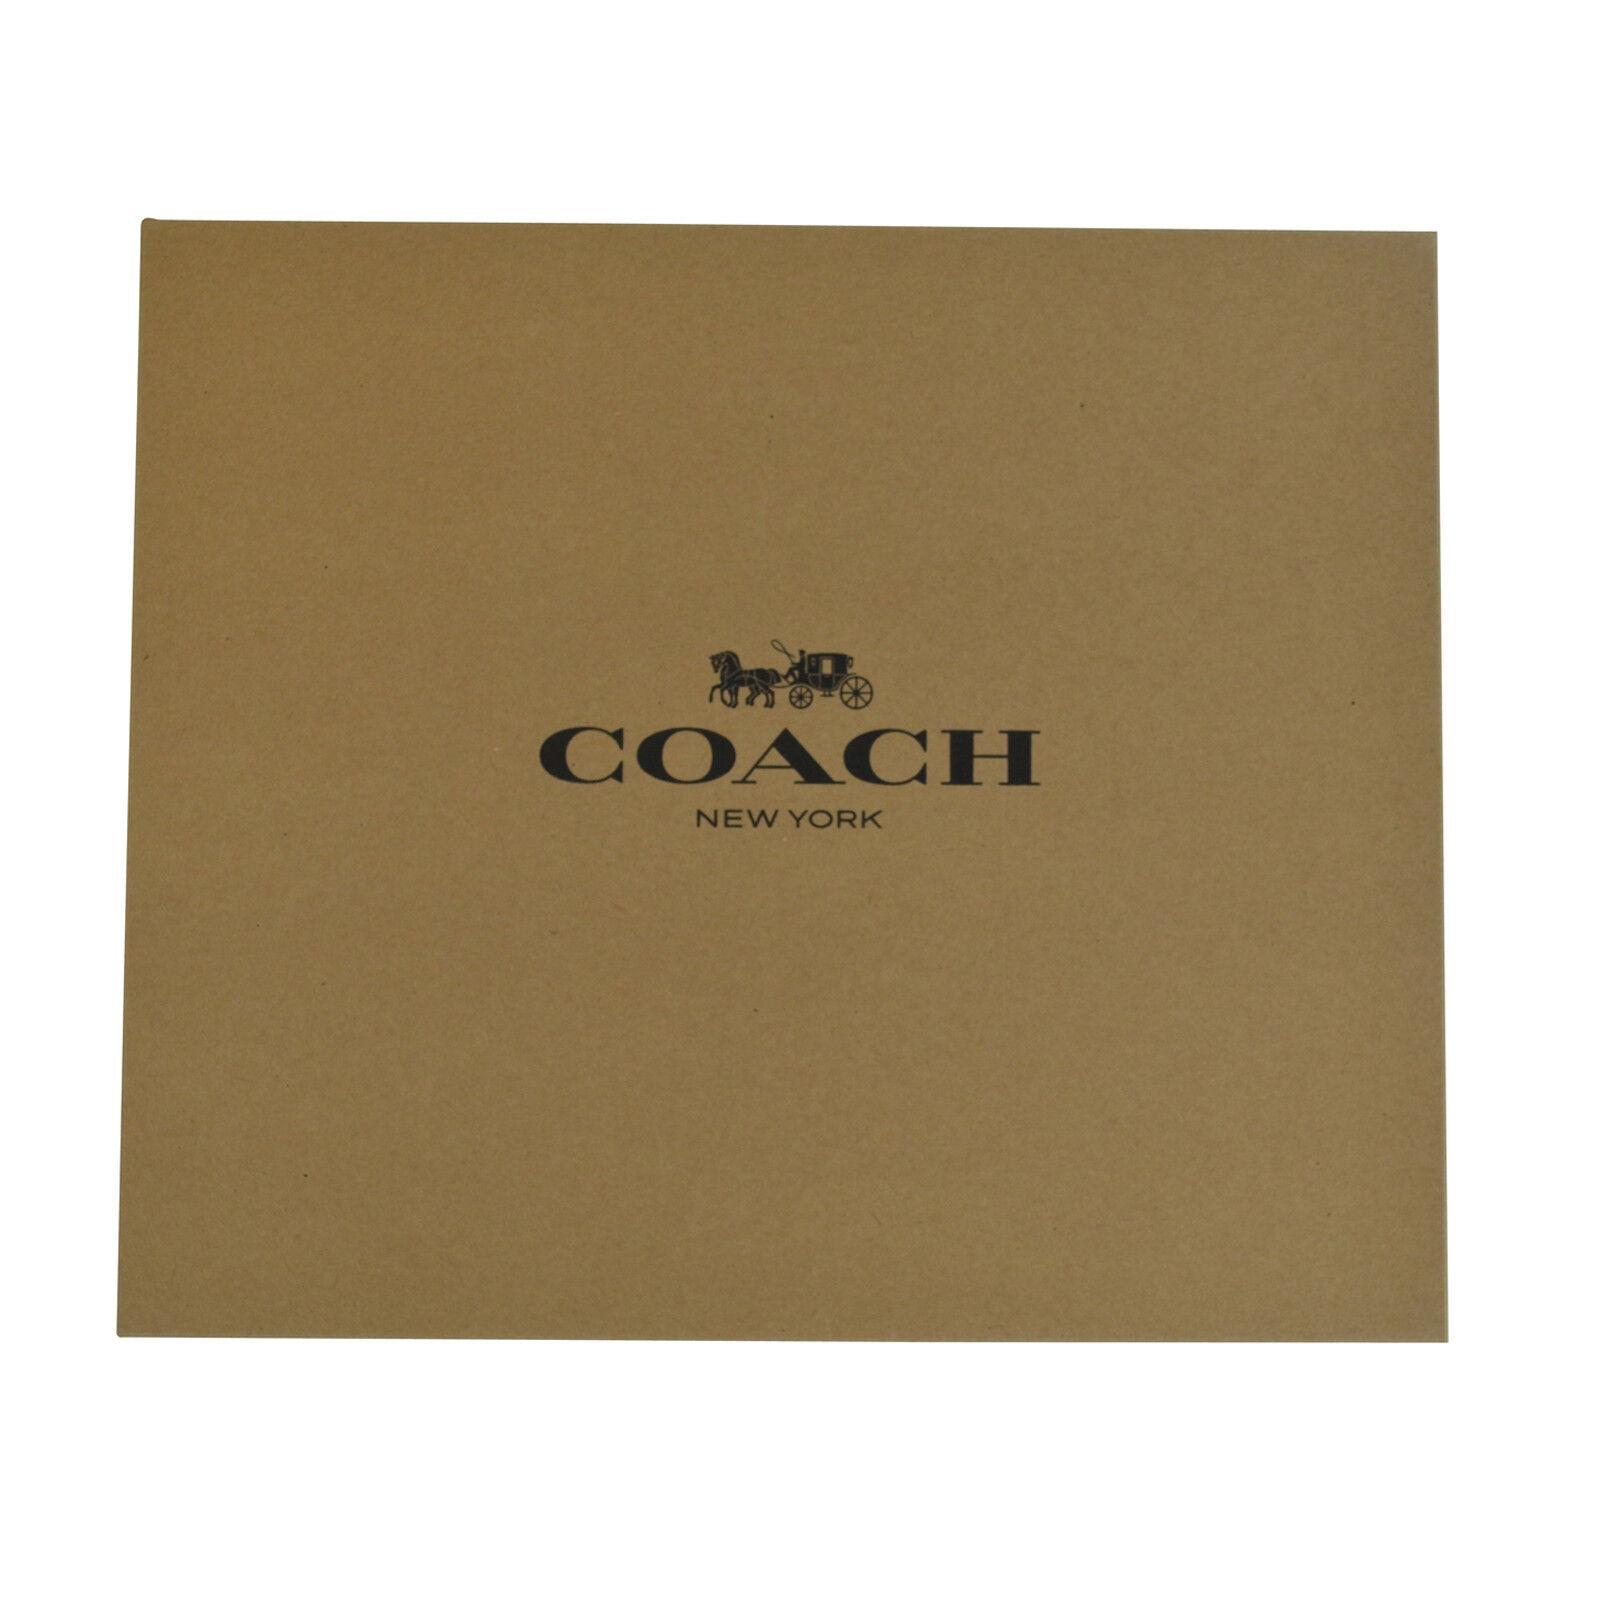 Coach Gift Box Medium Brown Black Logo For Handbag Bag Tote